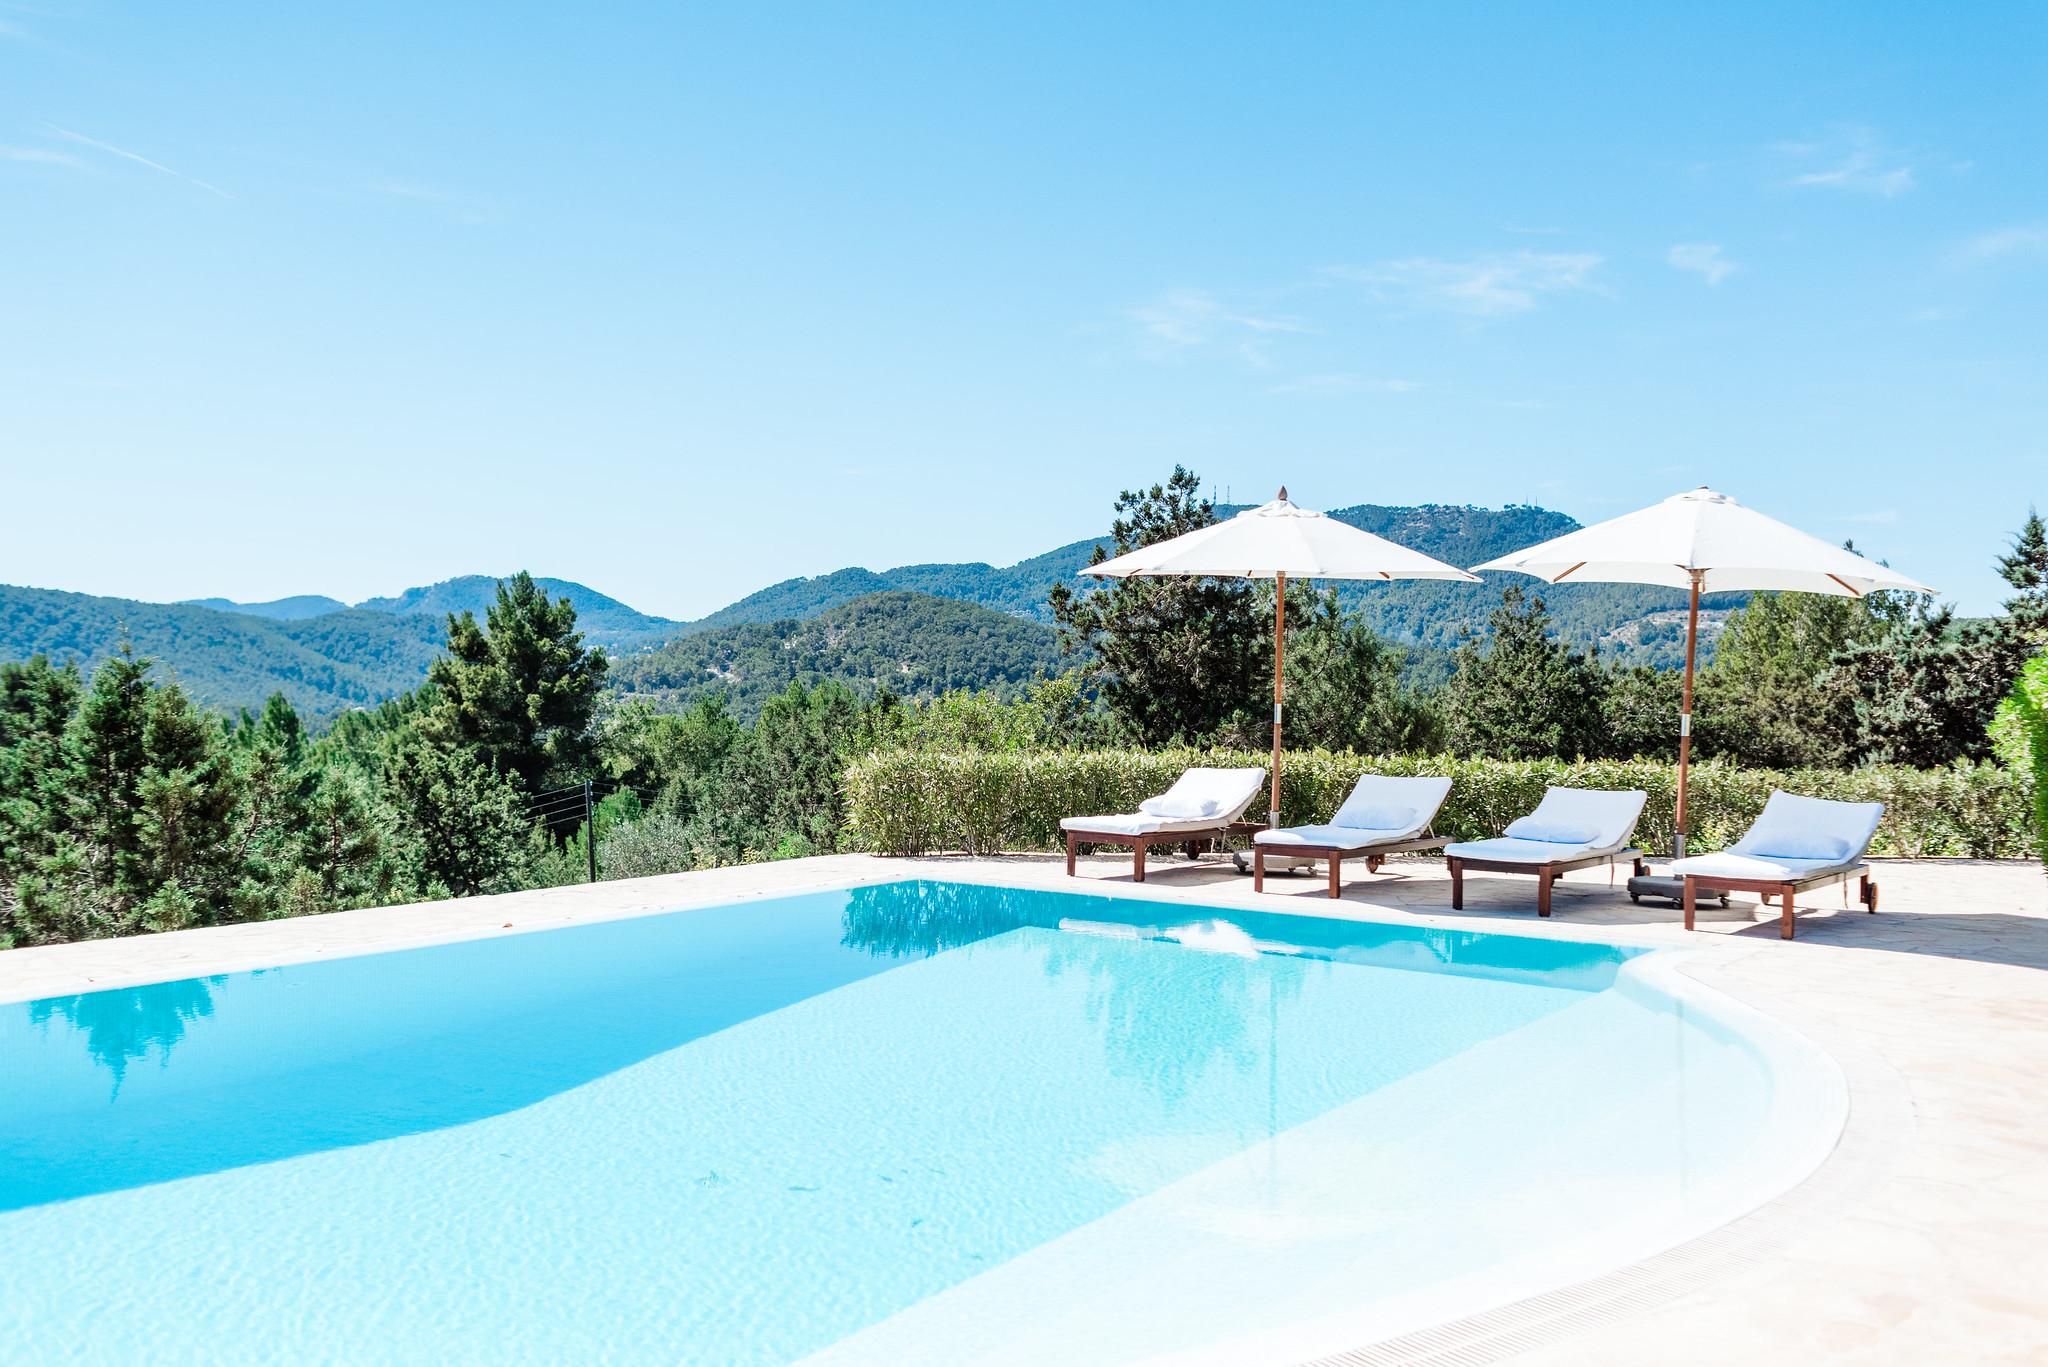 https://www.white-ibiza.com/wp-content/uploads/2020/06/white-ibiza-villas-villa-andrea-exterior-pool-shot.jpg